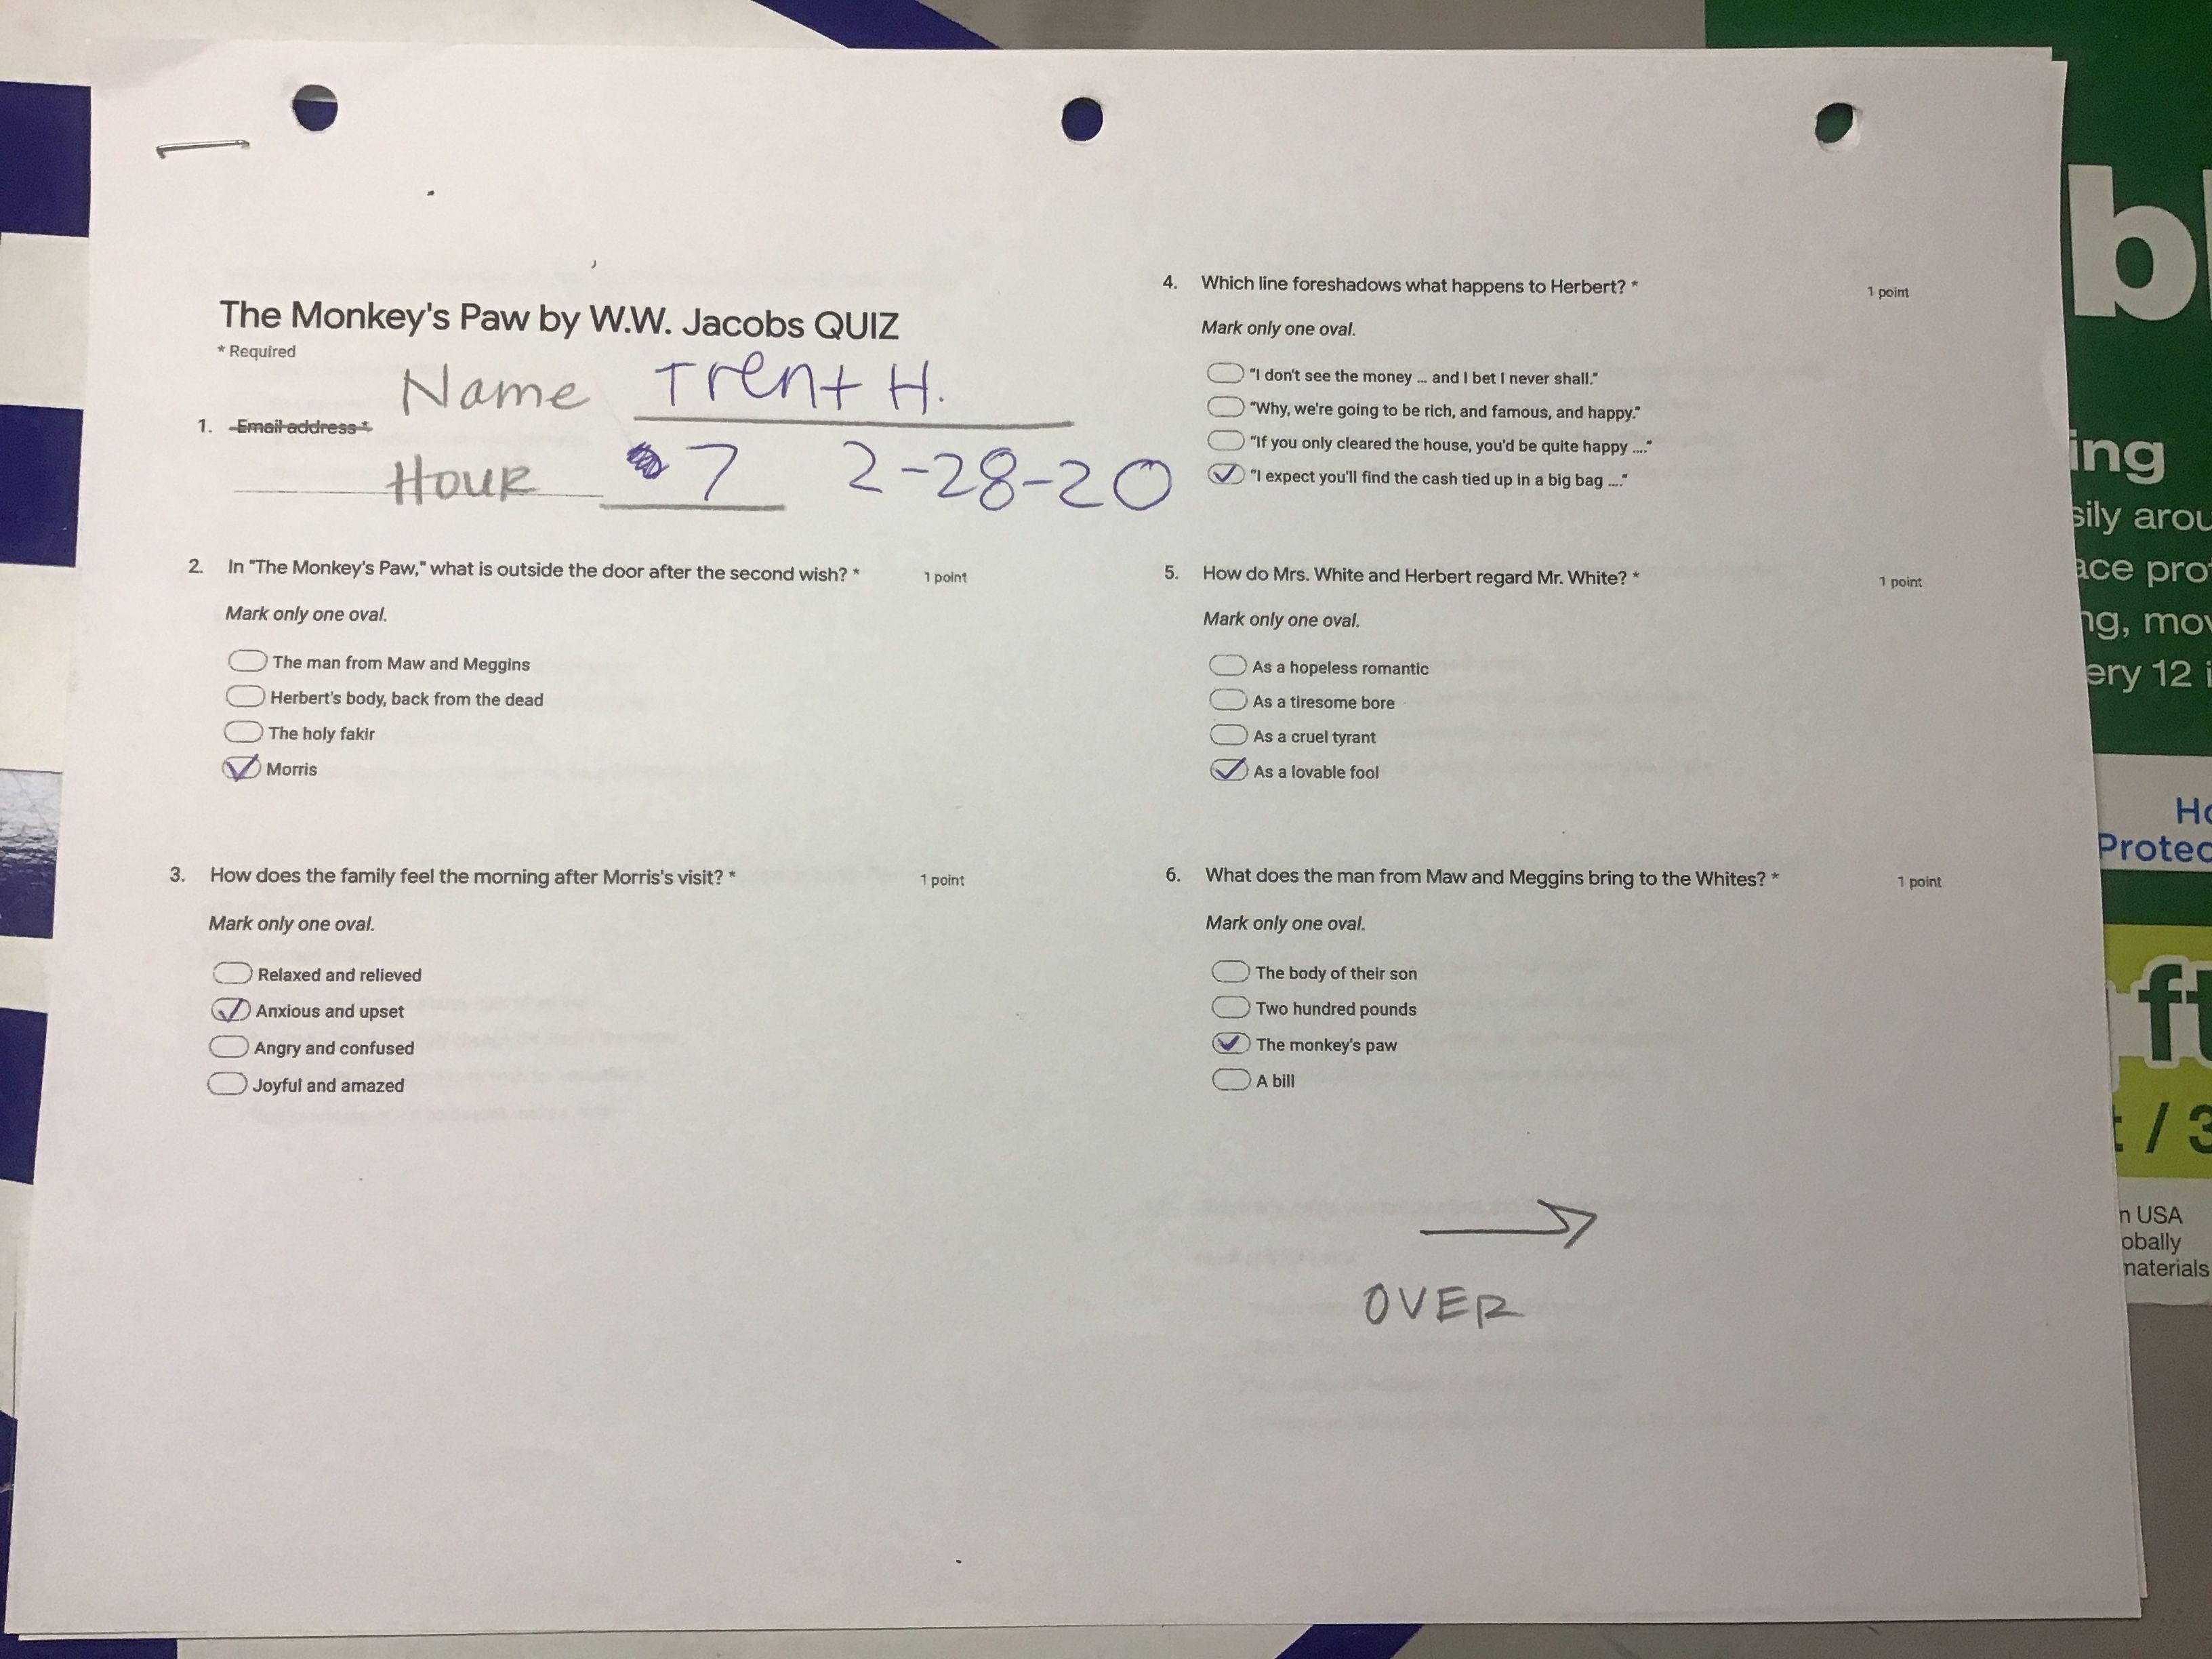 The Monkey S Paw By W W Jacobs Quiz Page 1 2 28 20 In